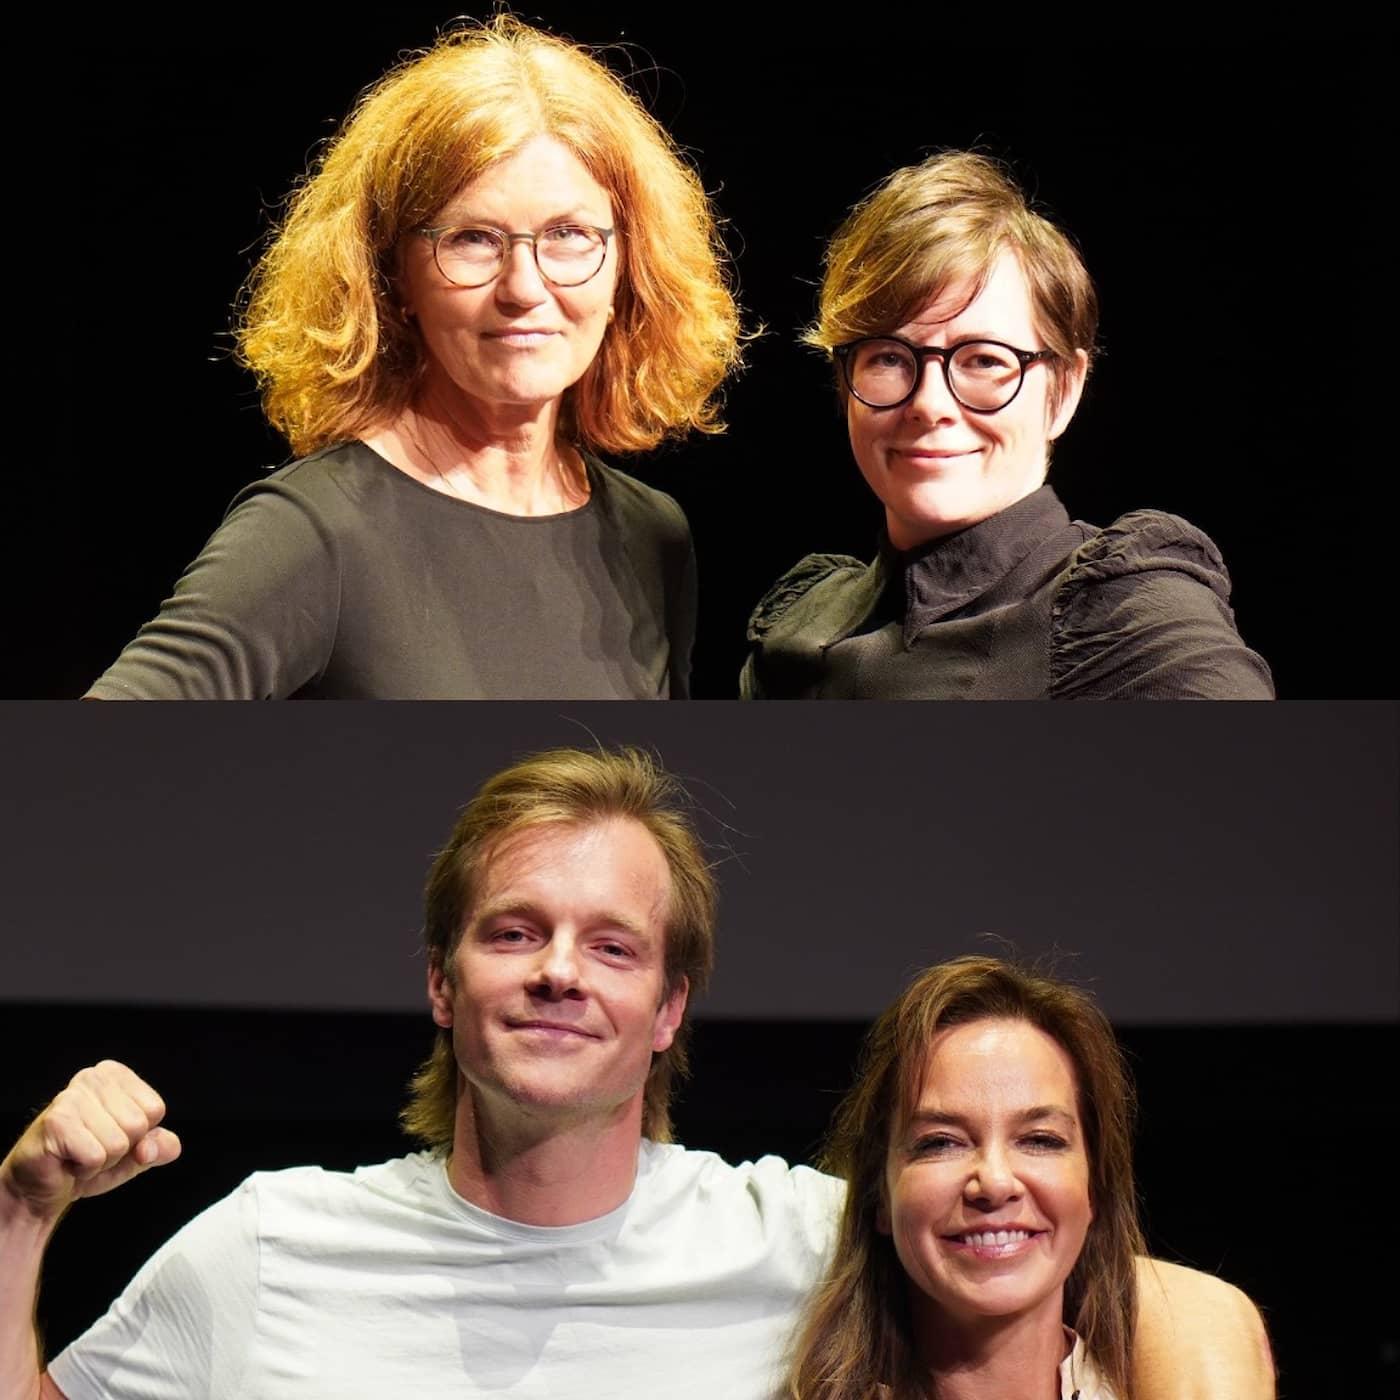 Spruträdda 90-talister! - Live från Lund Comedy Festival